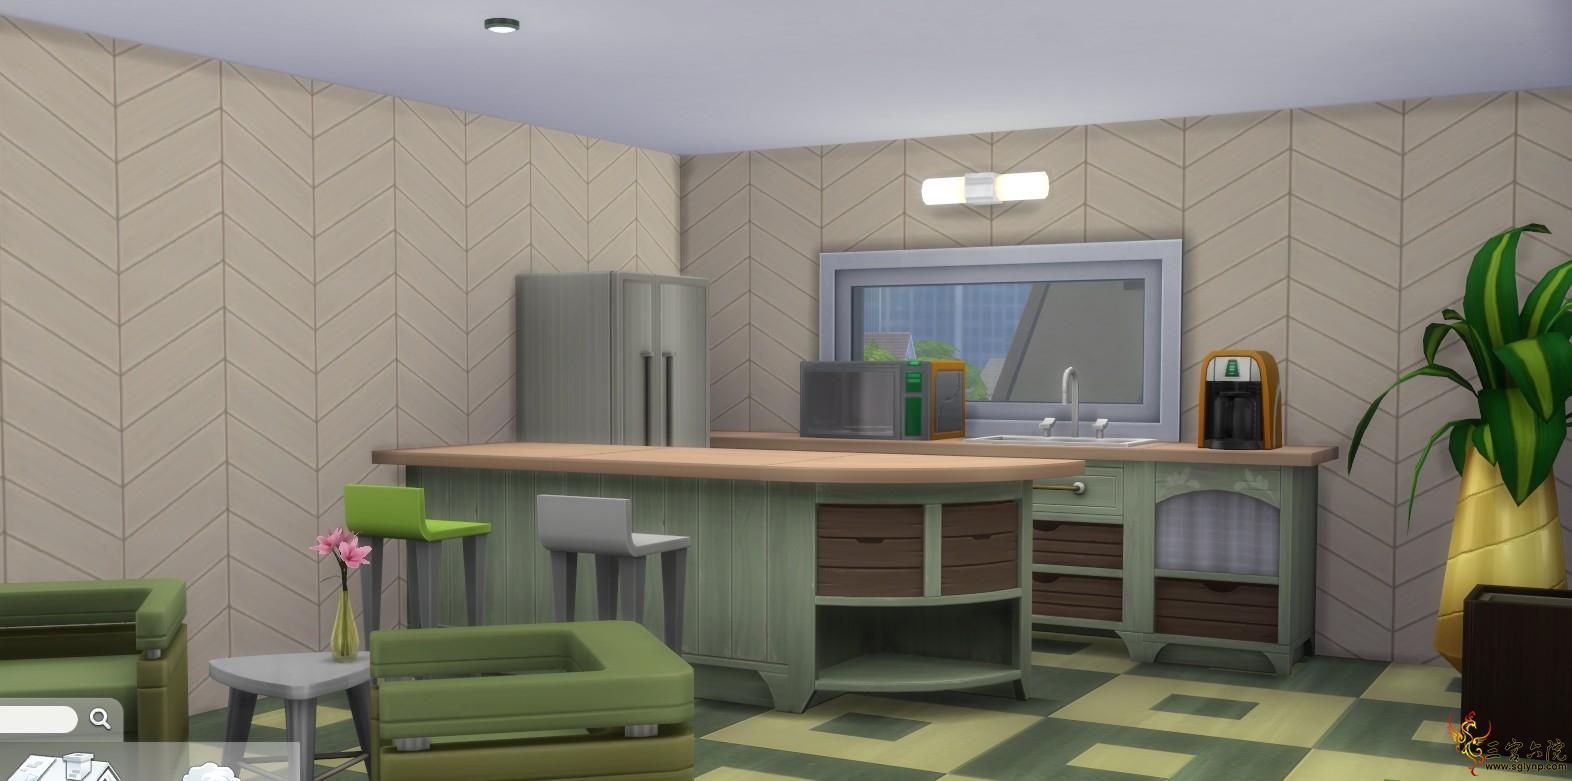 四楼厨房.png